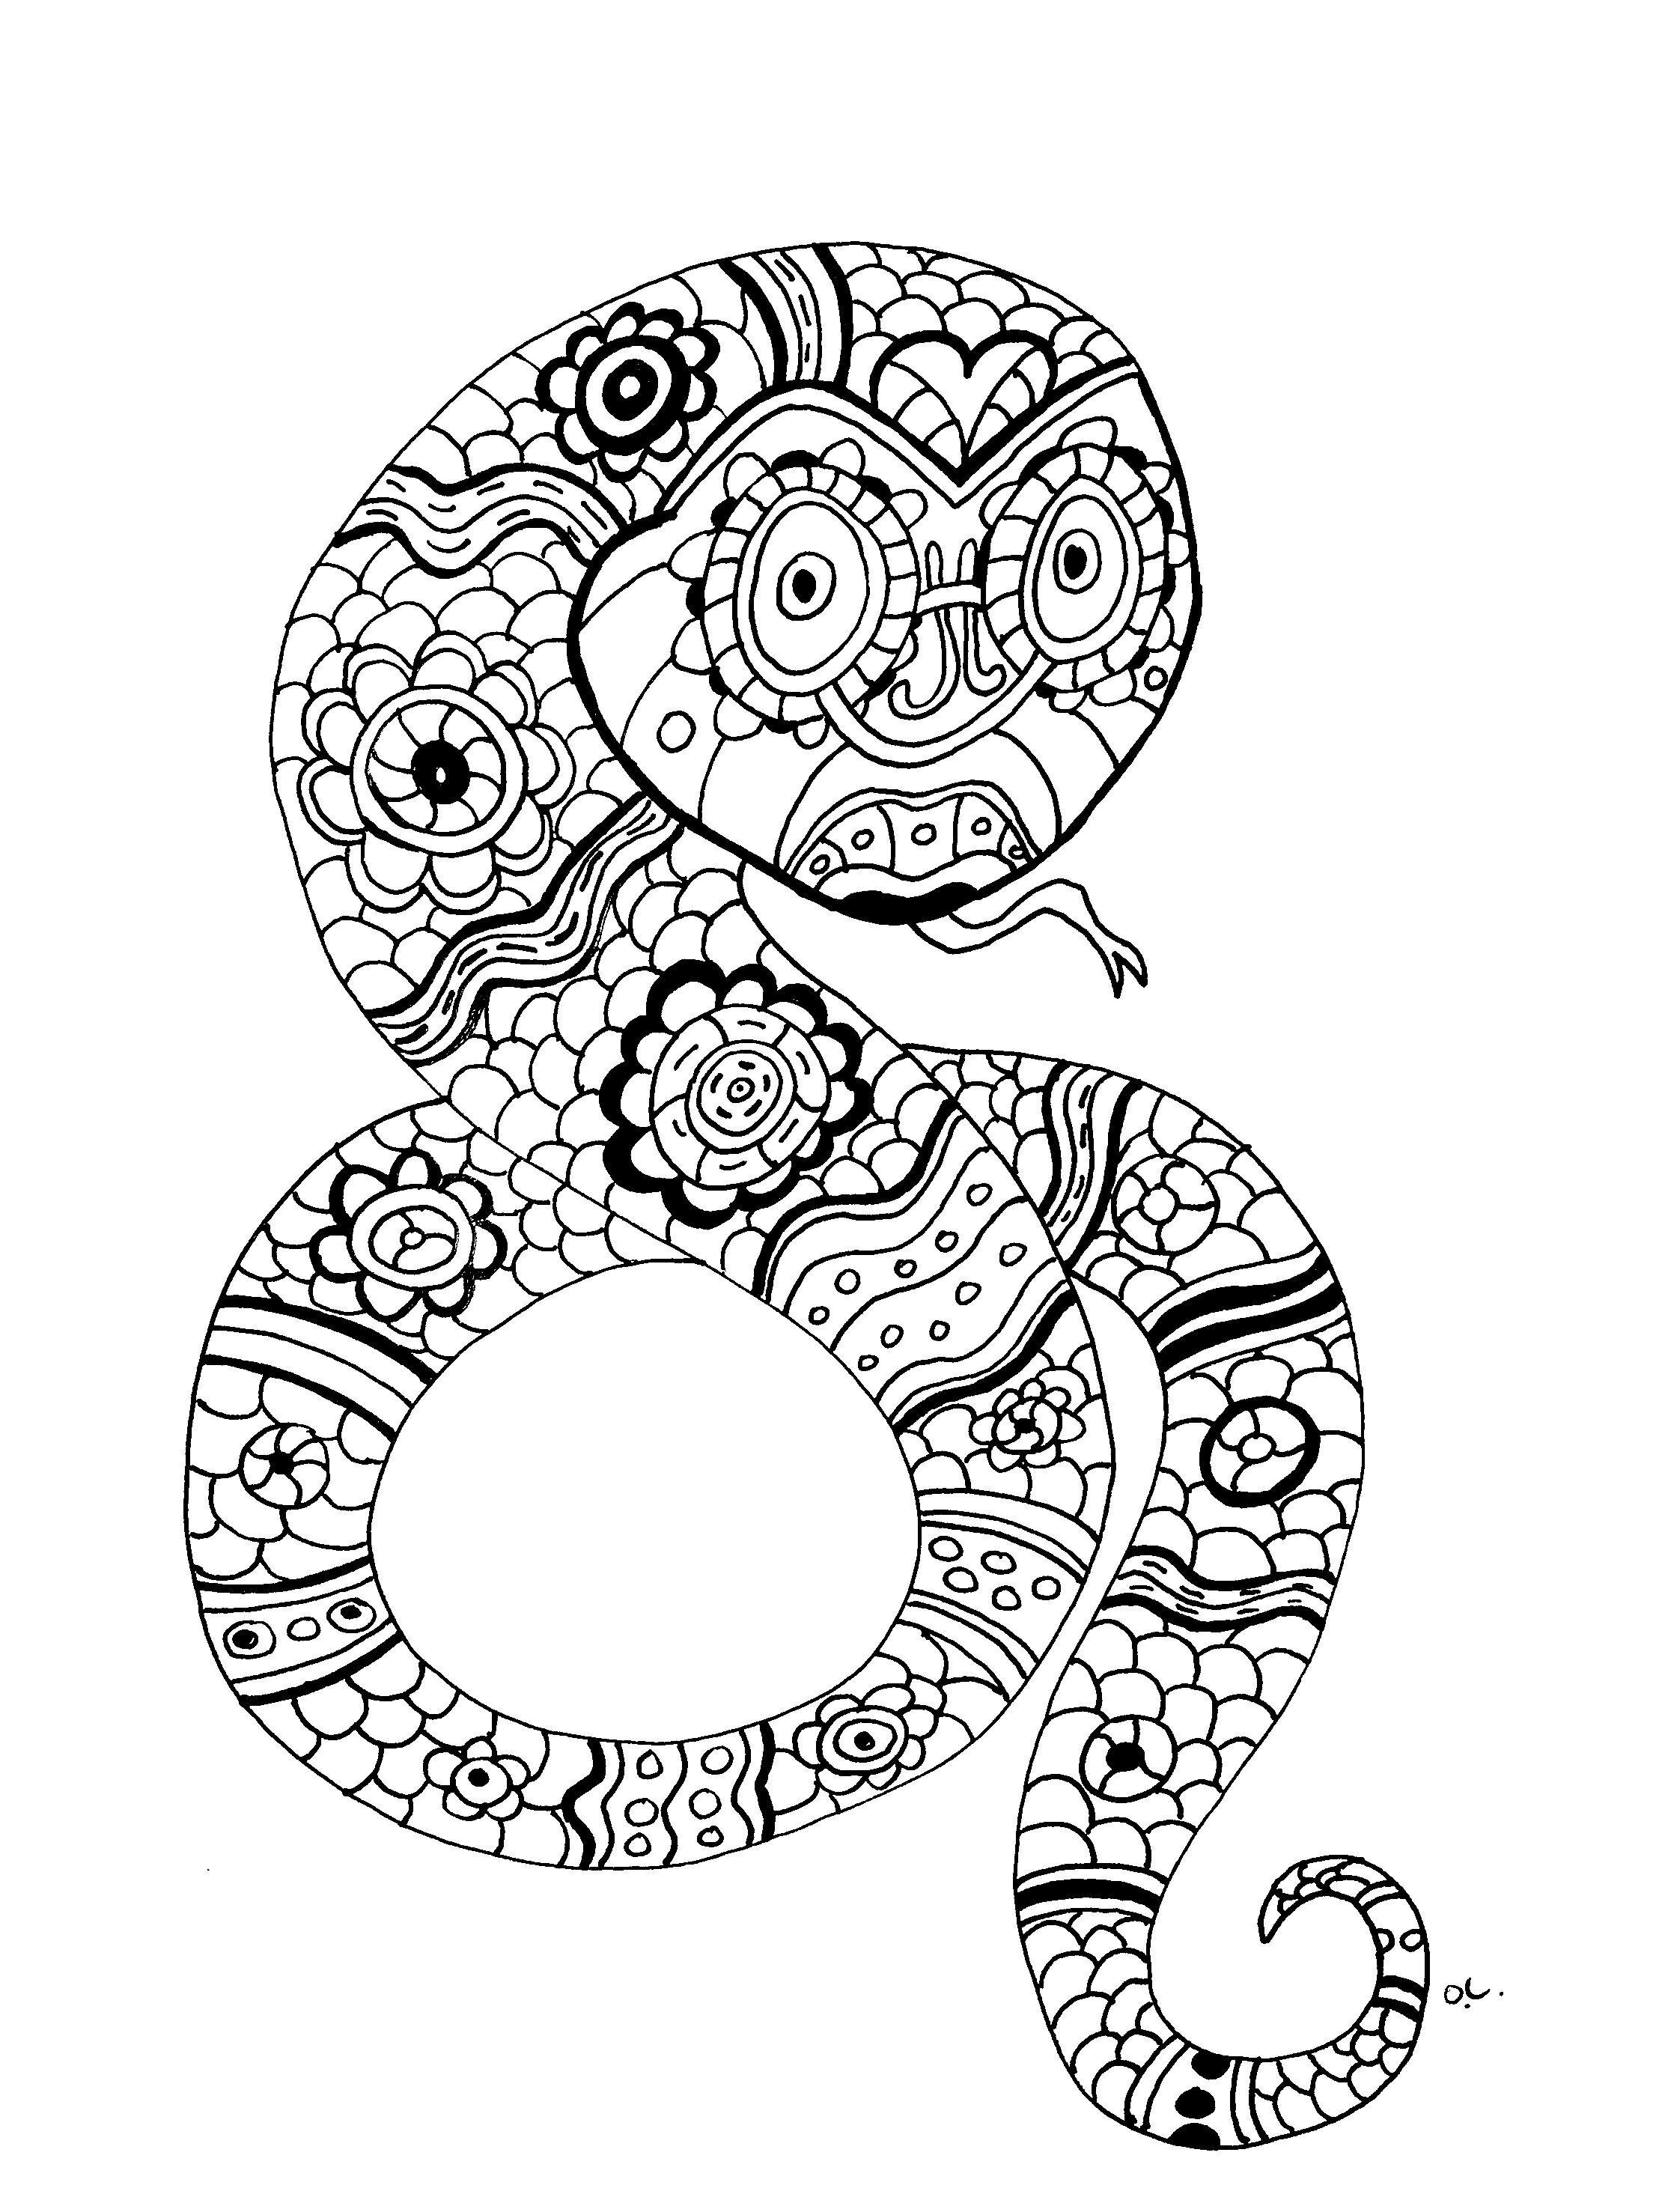 Snake Mandala Coloring Pages Download Mandala Malvorlagen Malvorlagen Ausmalen